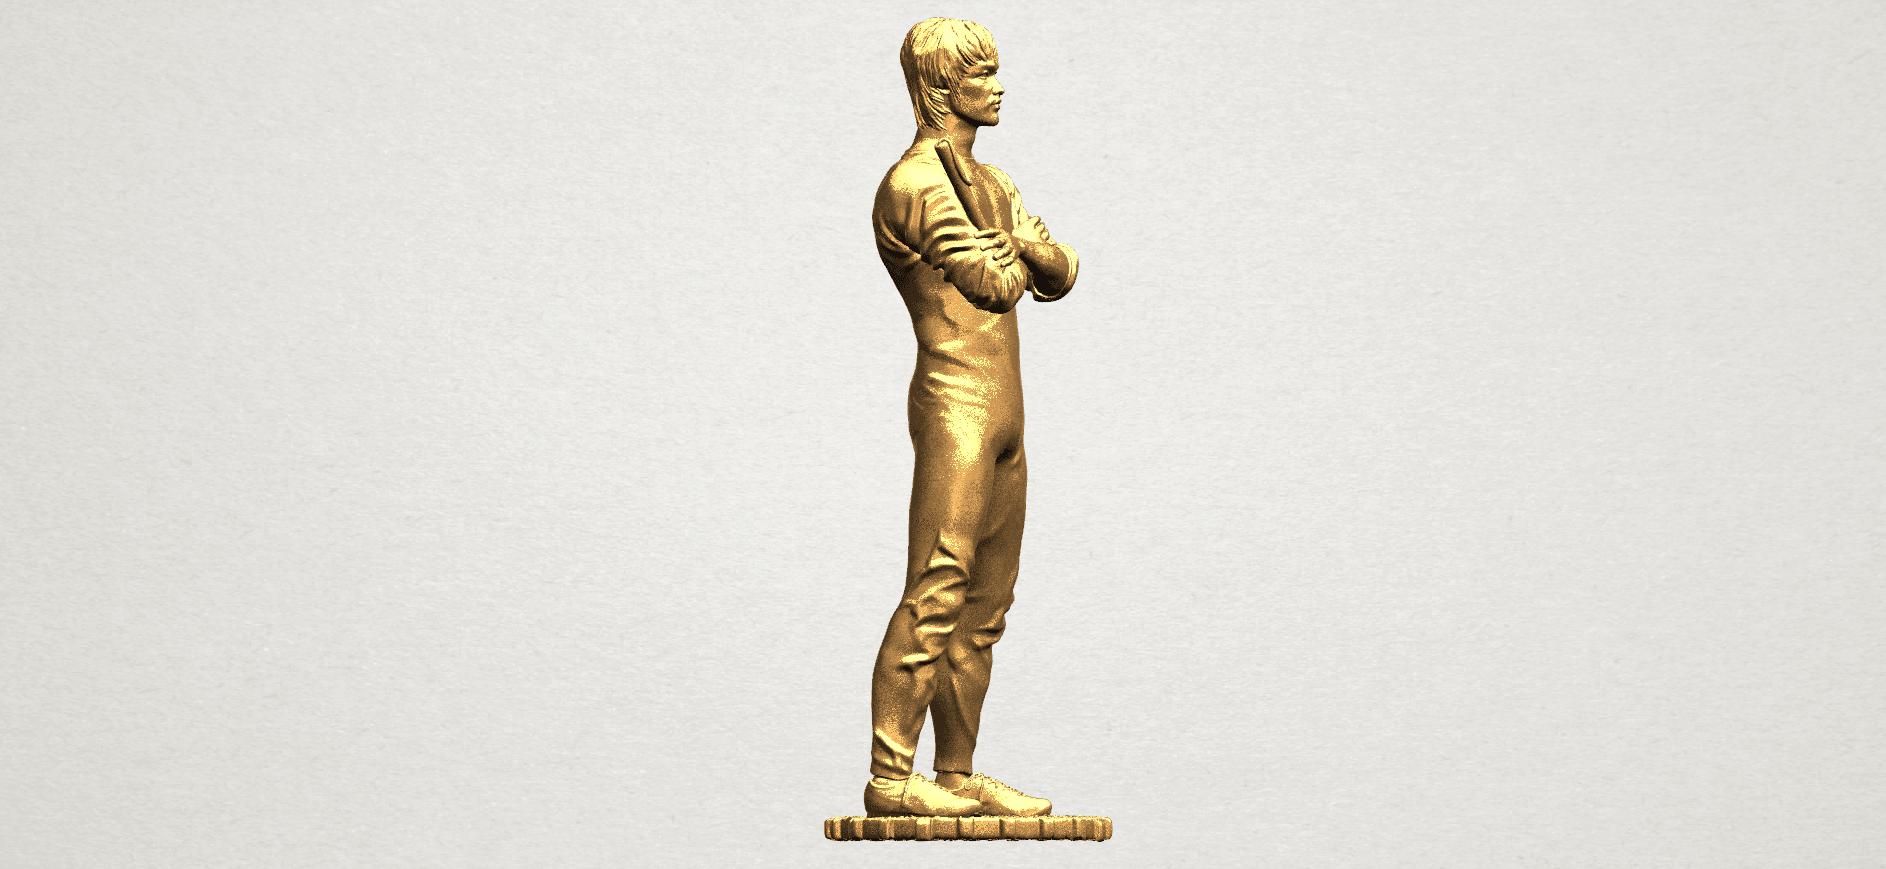 Bruce Lee A07.png Download free STL file Bruce Lee • 3D printing design, GeorgesNikkei